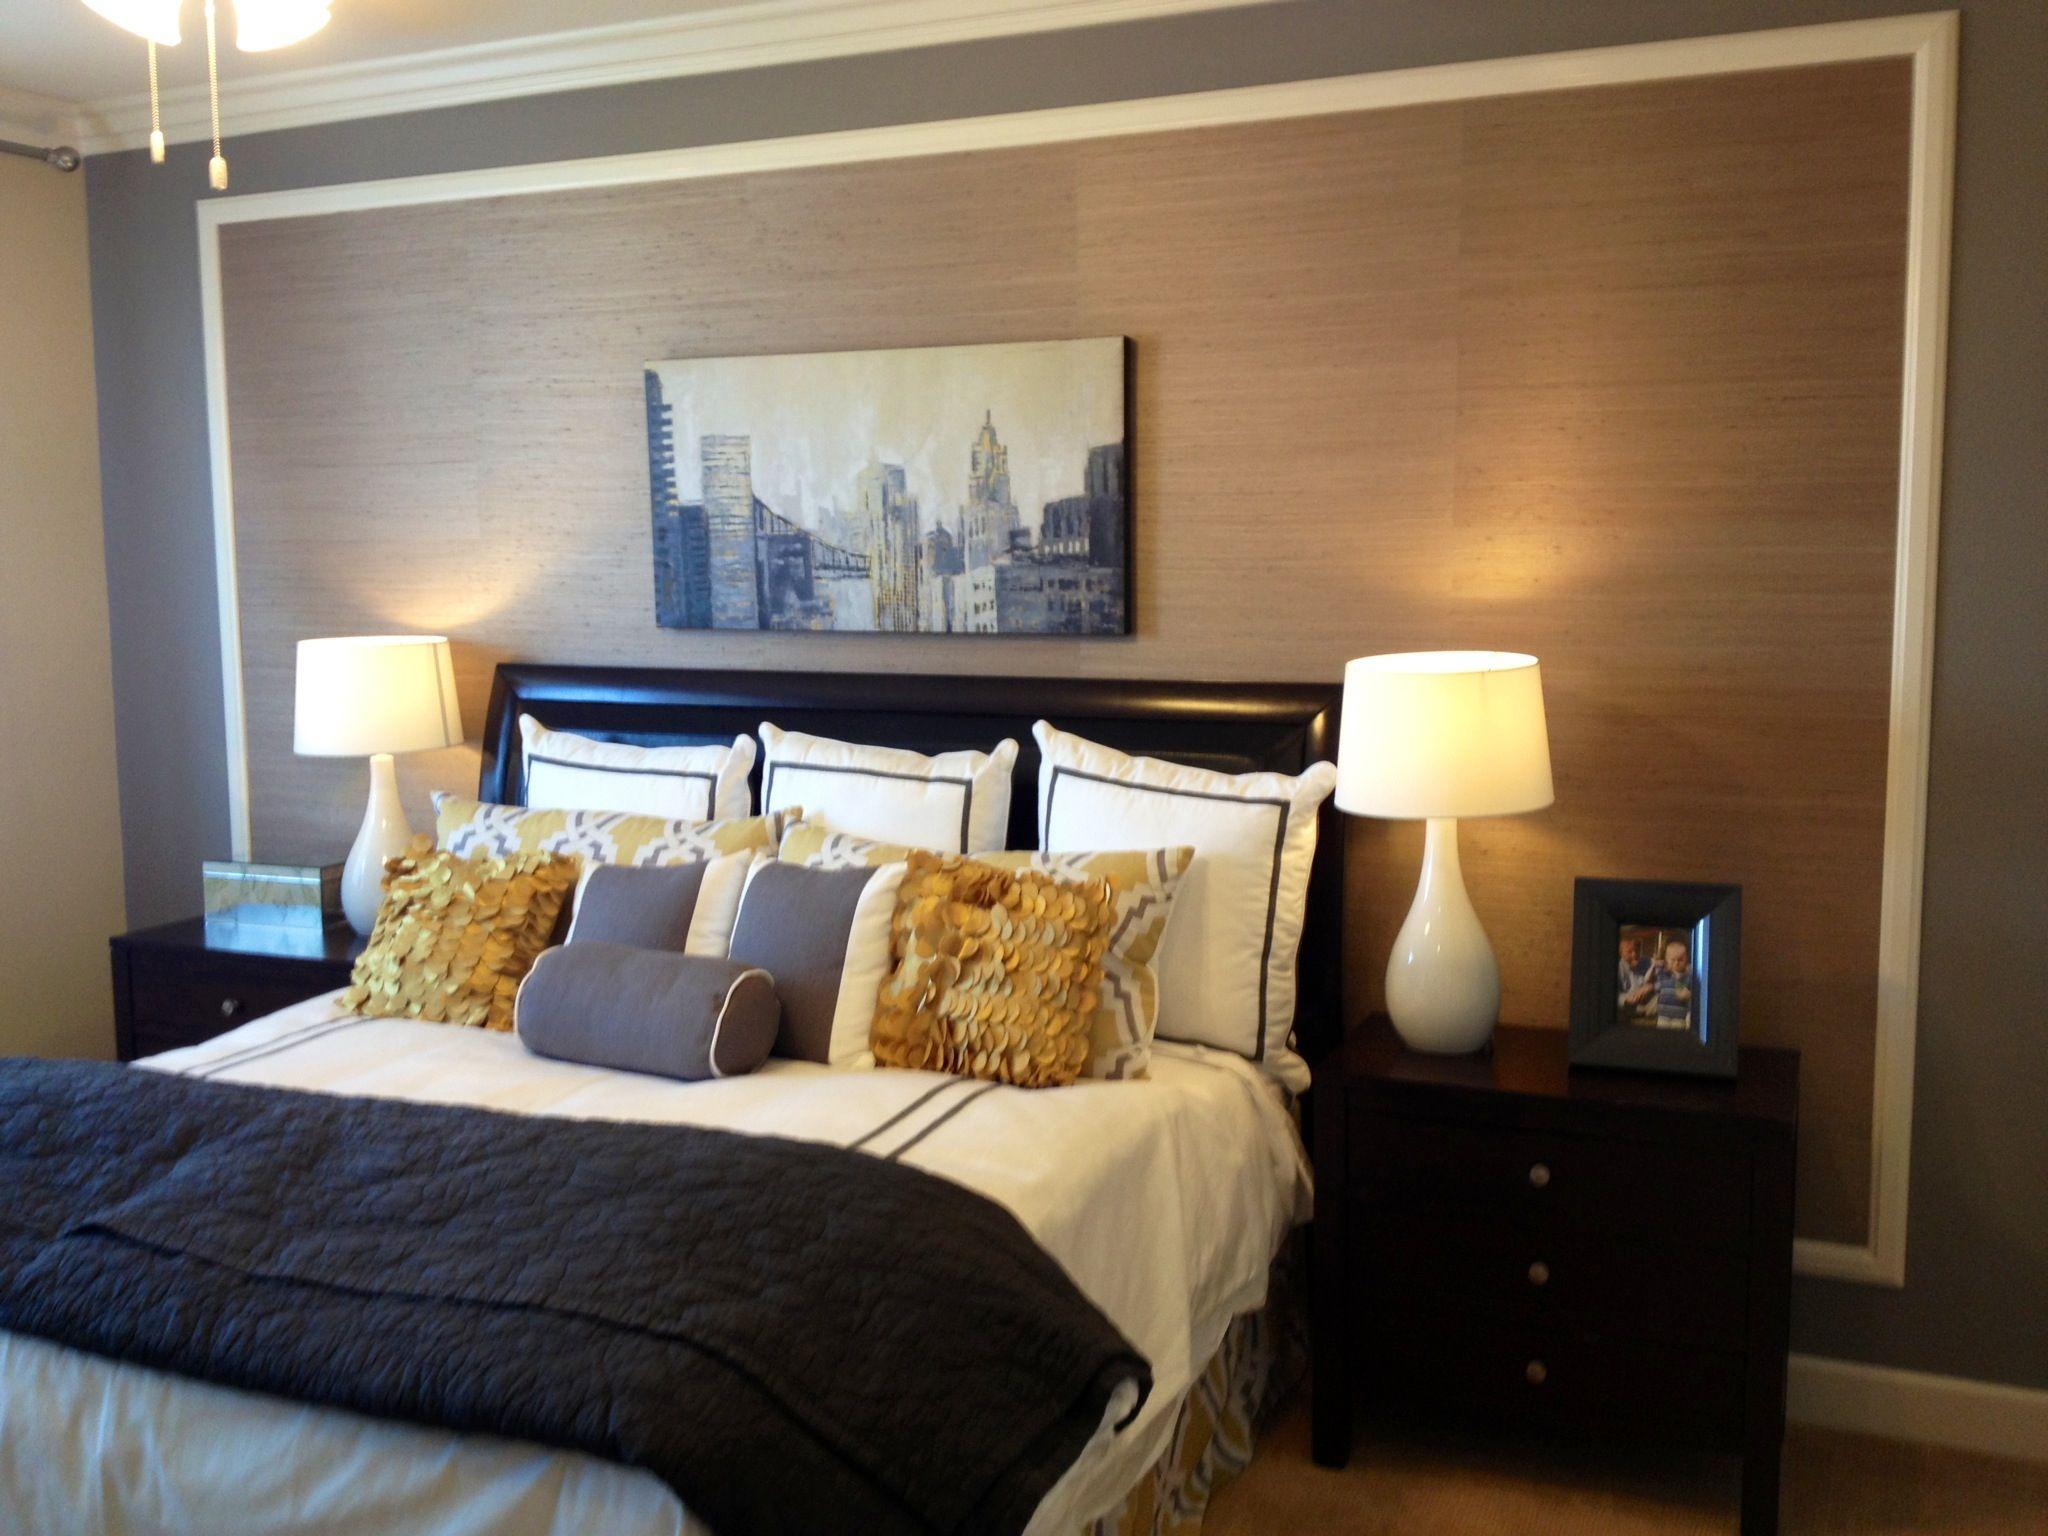 Best Framed Textured Wallpaper Master Bedrooms Decor Bedroom 640 x 480